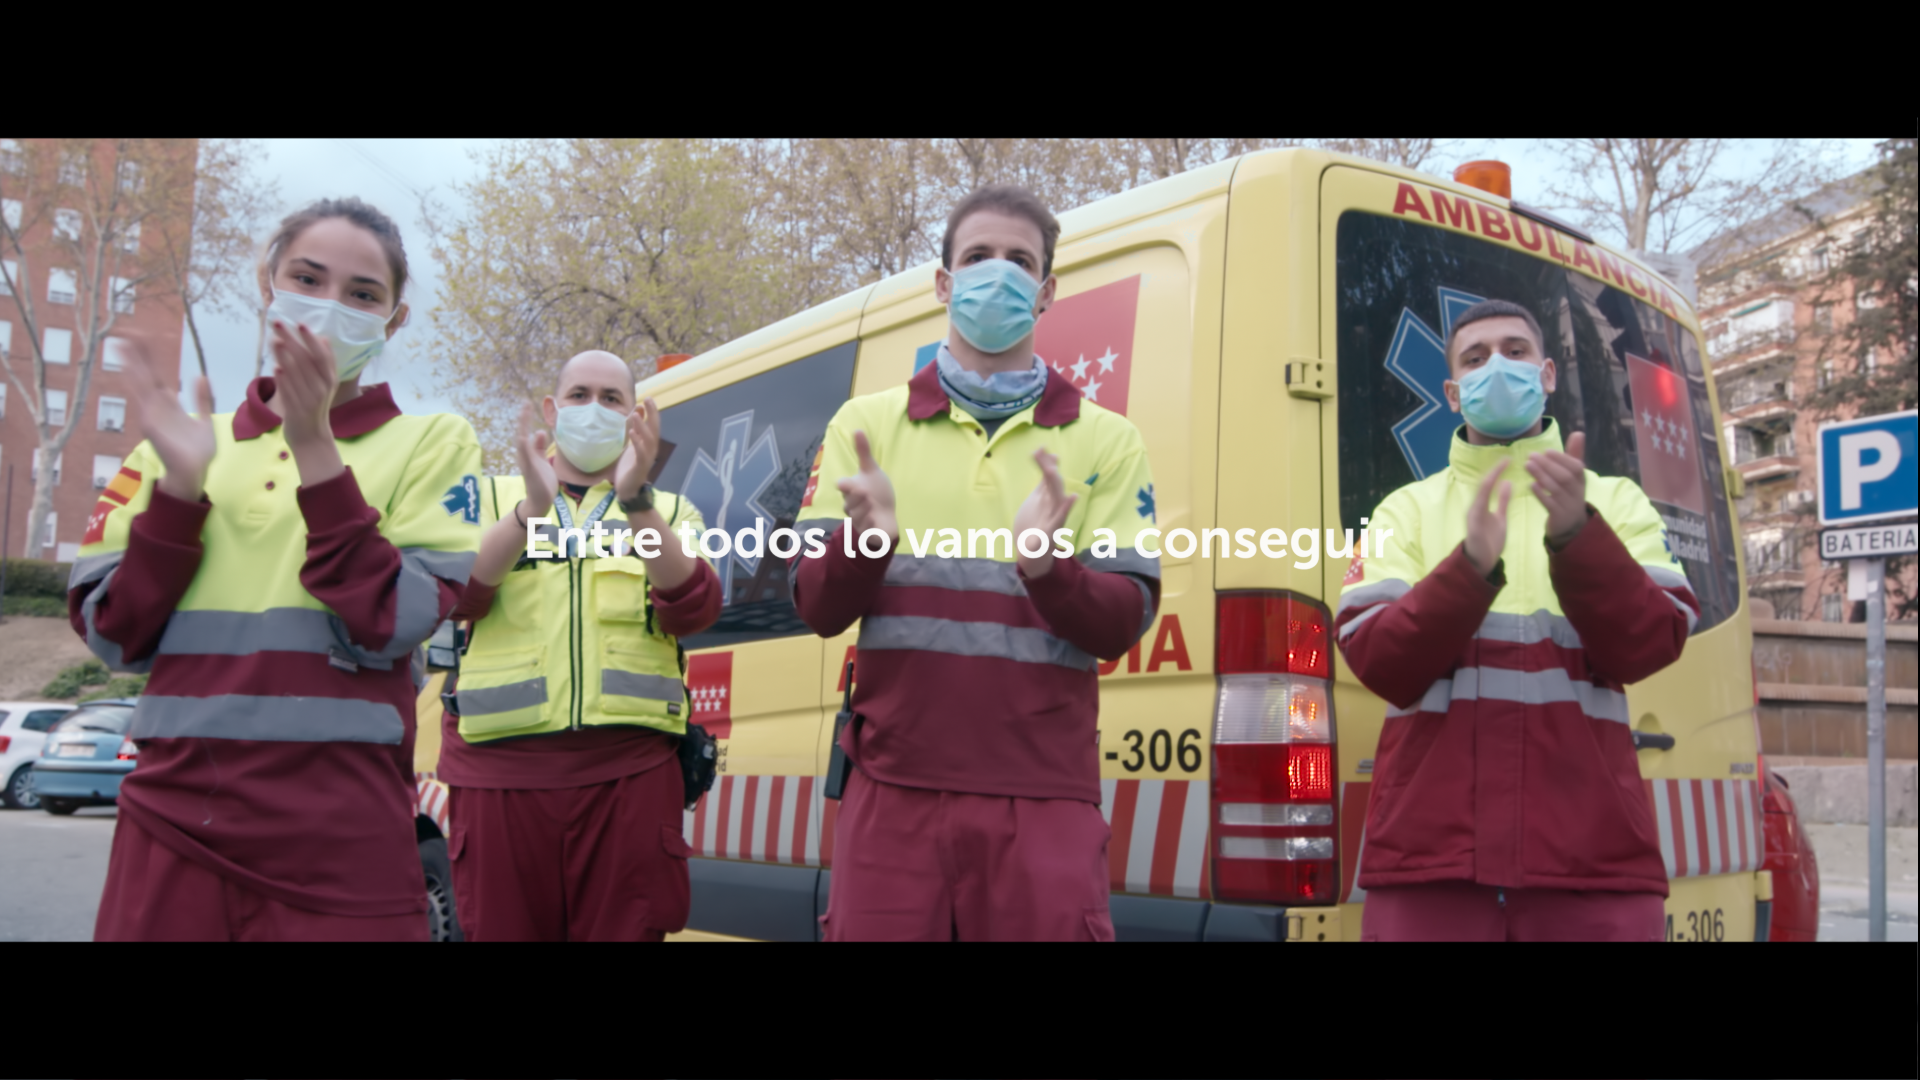 quedate-en-casa-rtve-el-exilio-anuncio-covid-tve-ambulancia-1920x1080.png